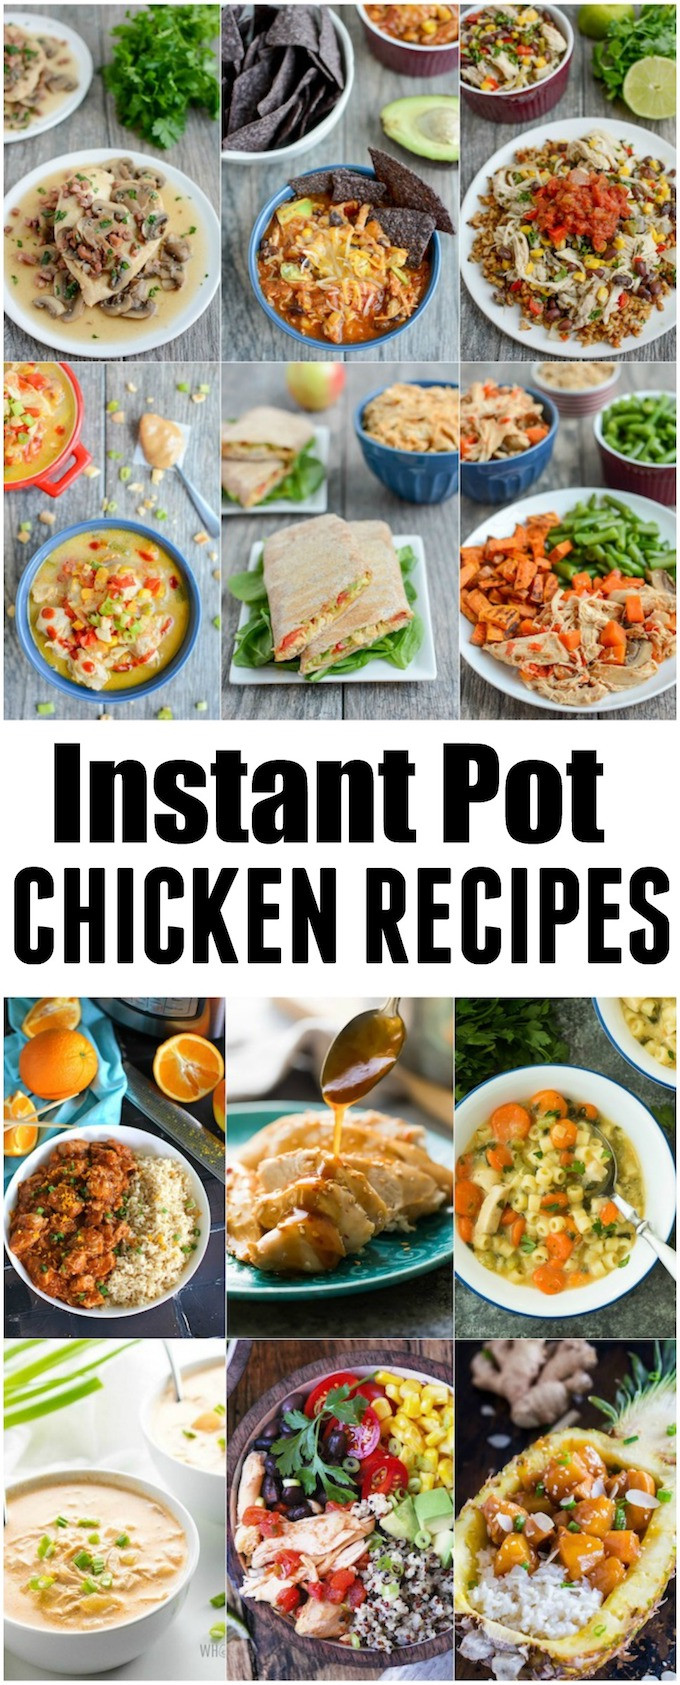 Healthy Chicken Instant Pot Recipes  Instant Pot Chicken Recipes